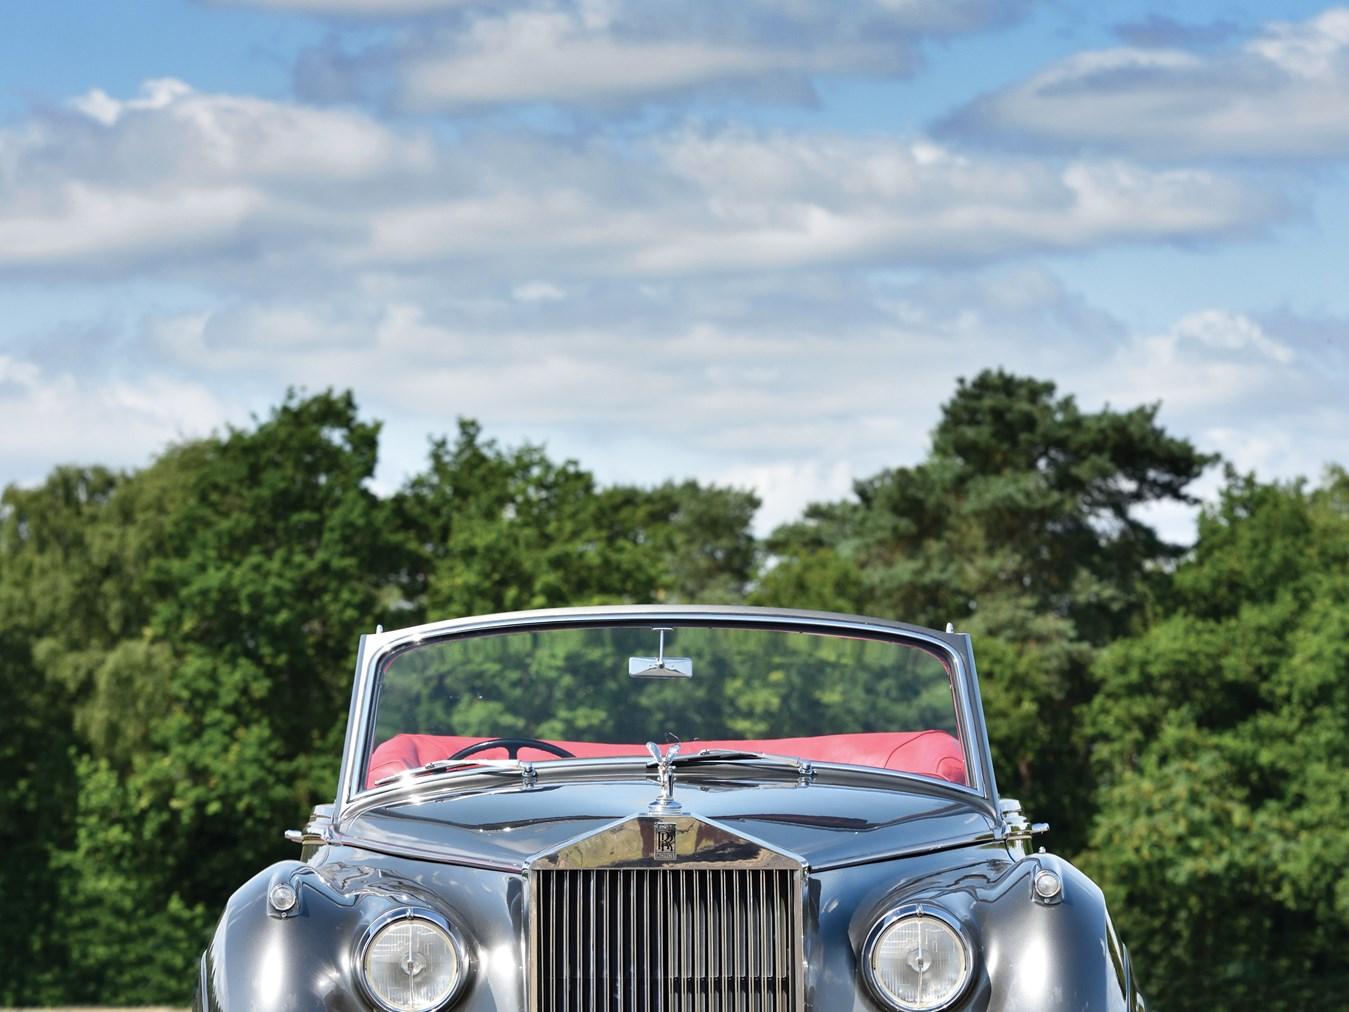 1960 Rolls-Royce Silver Cloud II Drophead Coupé Adaptation by H.J. Mulliner